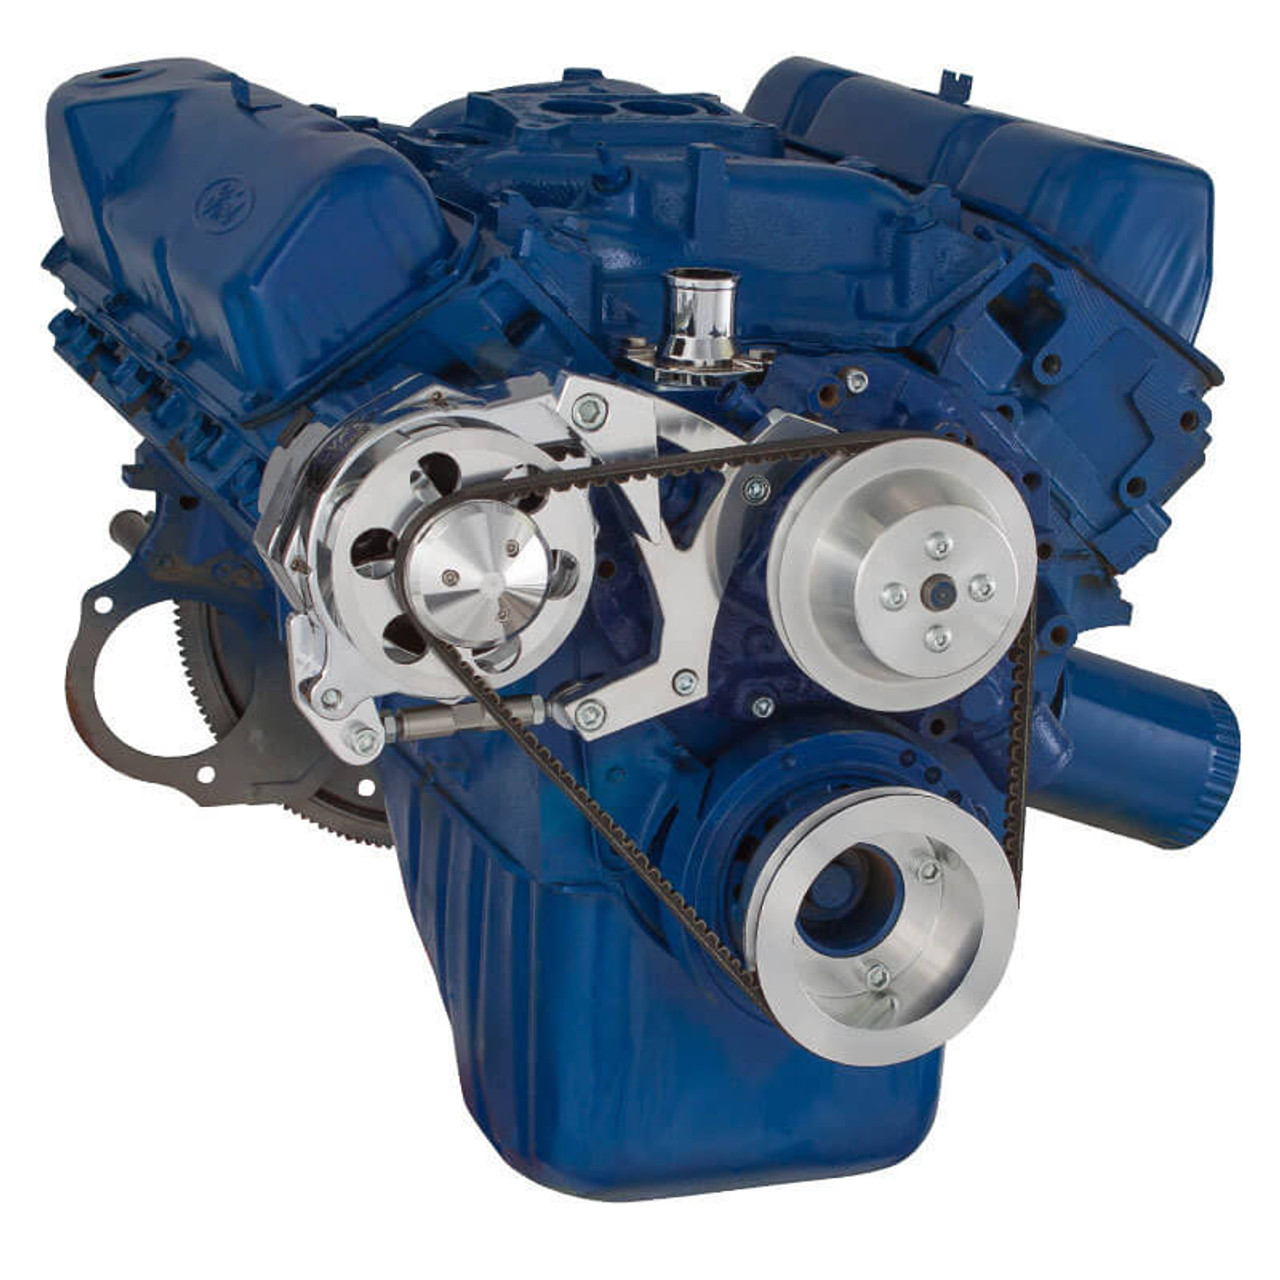 ford 351c, 351m \u0026 400 v belt pulley system (351c) alternator onlyford 351c, 351m \u0026 400 v belt system alternator only